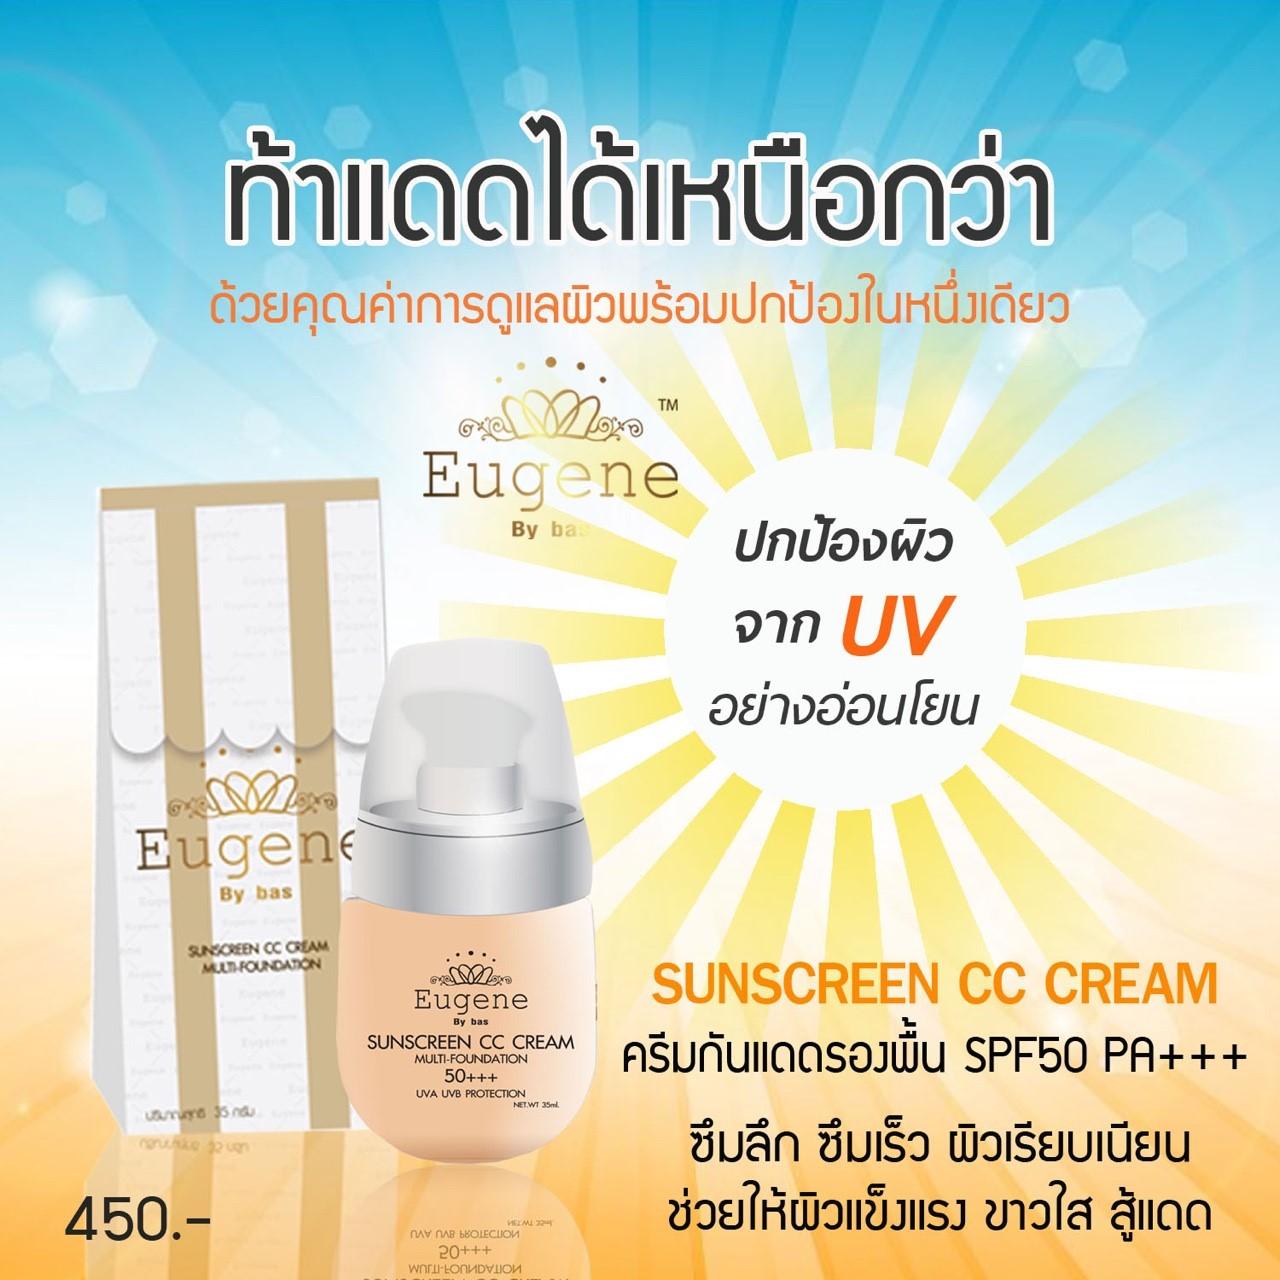 Eugene Sunscreen CC Cream 50++ กันแดดเนื้อบางเบา ปกปิดริ้วรอย ผิวหน้าเรียบเนียน เปล่งปลั่ง ฉ่ำวาว (บรรจุ 35g.)